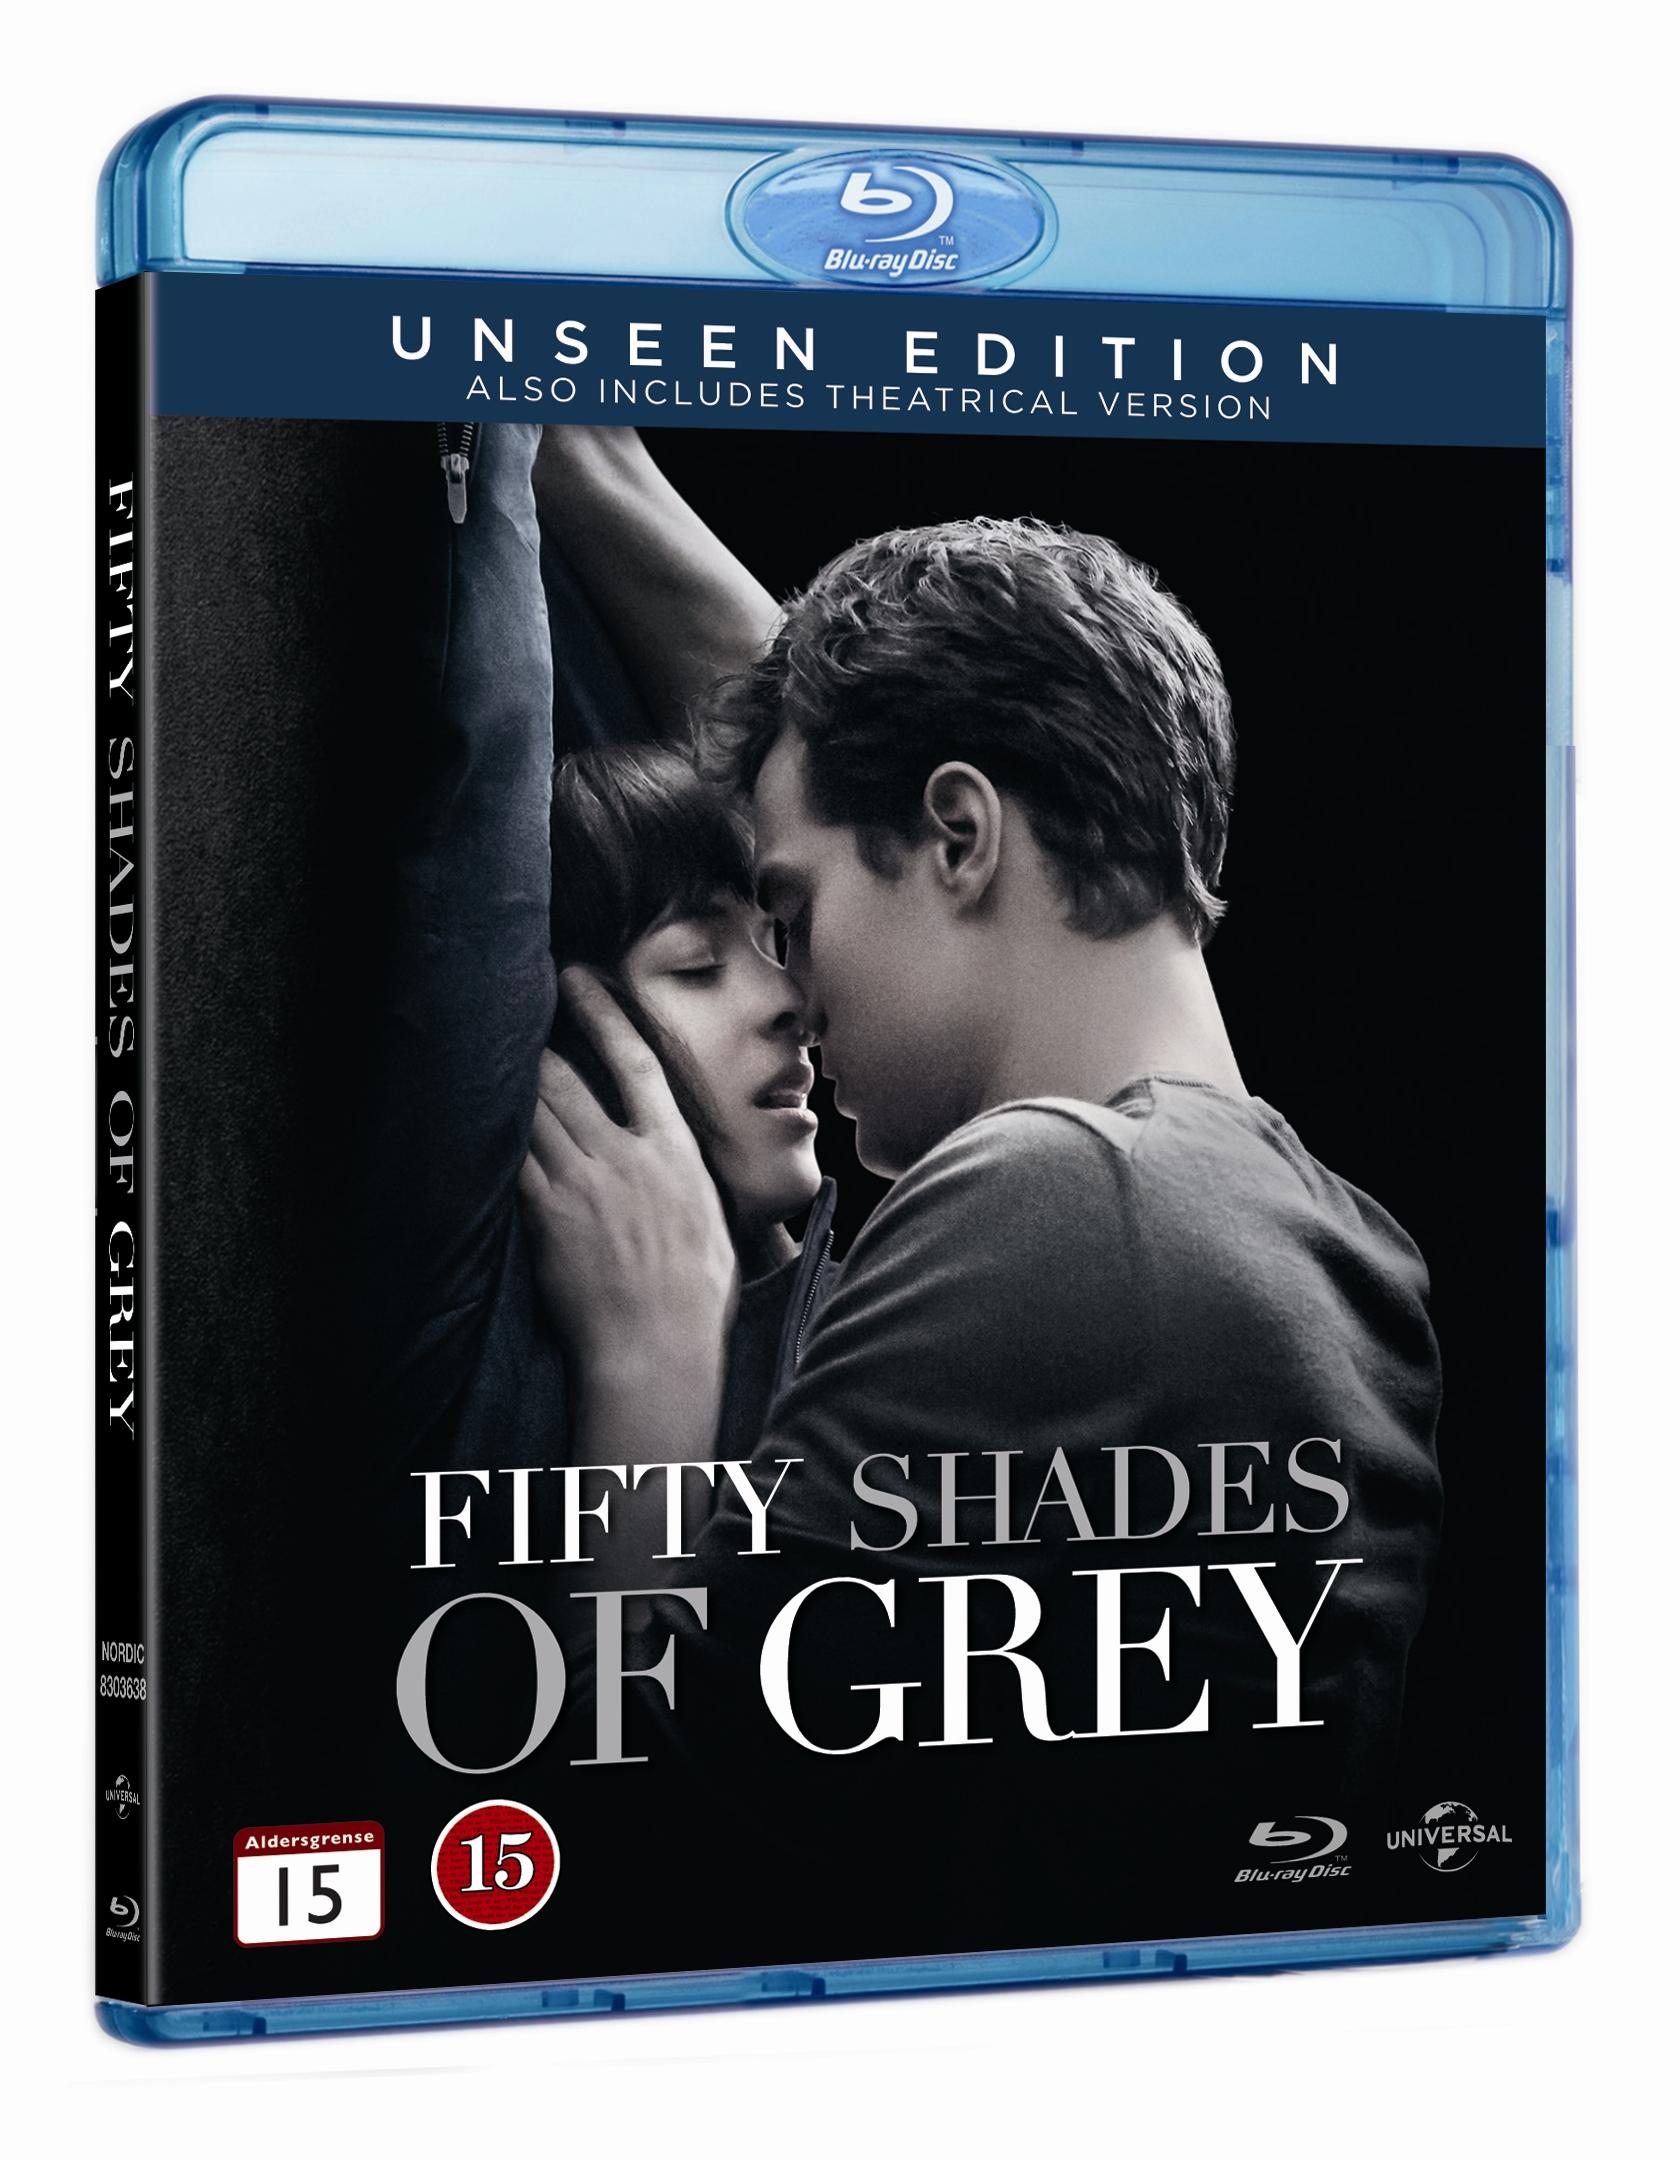 Fifty Shades of Grey - Jamie Dornan - Film - Universal - 5053083036386 - 19/6-2015